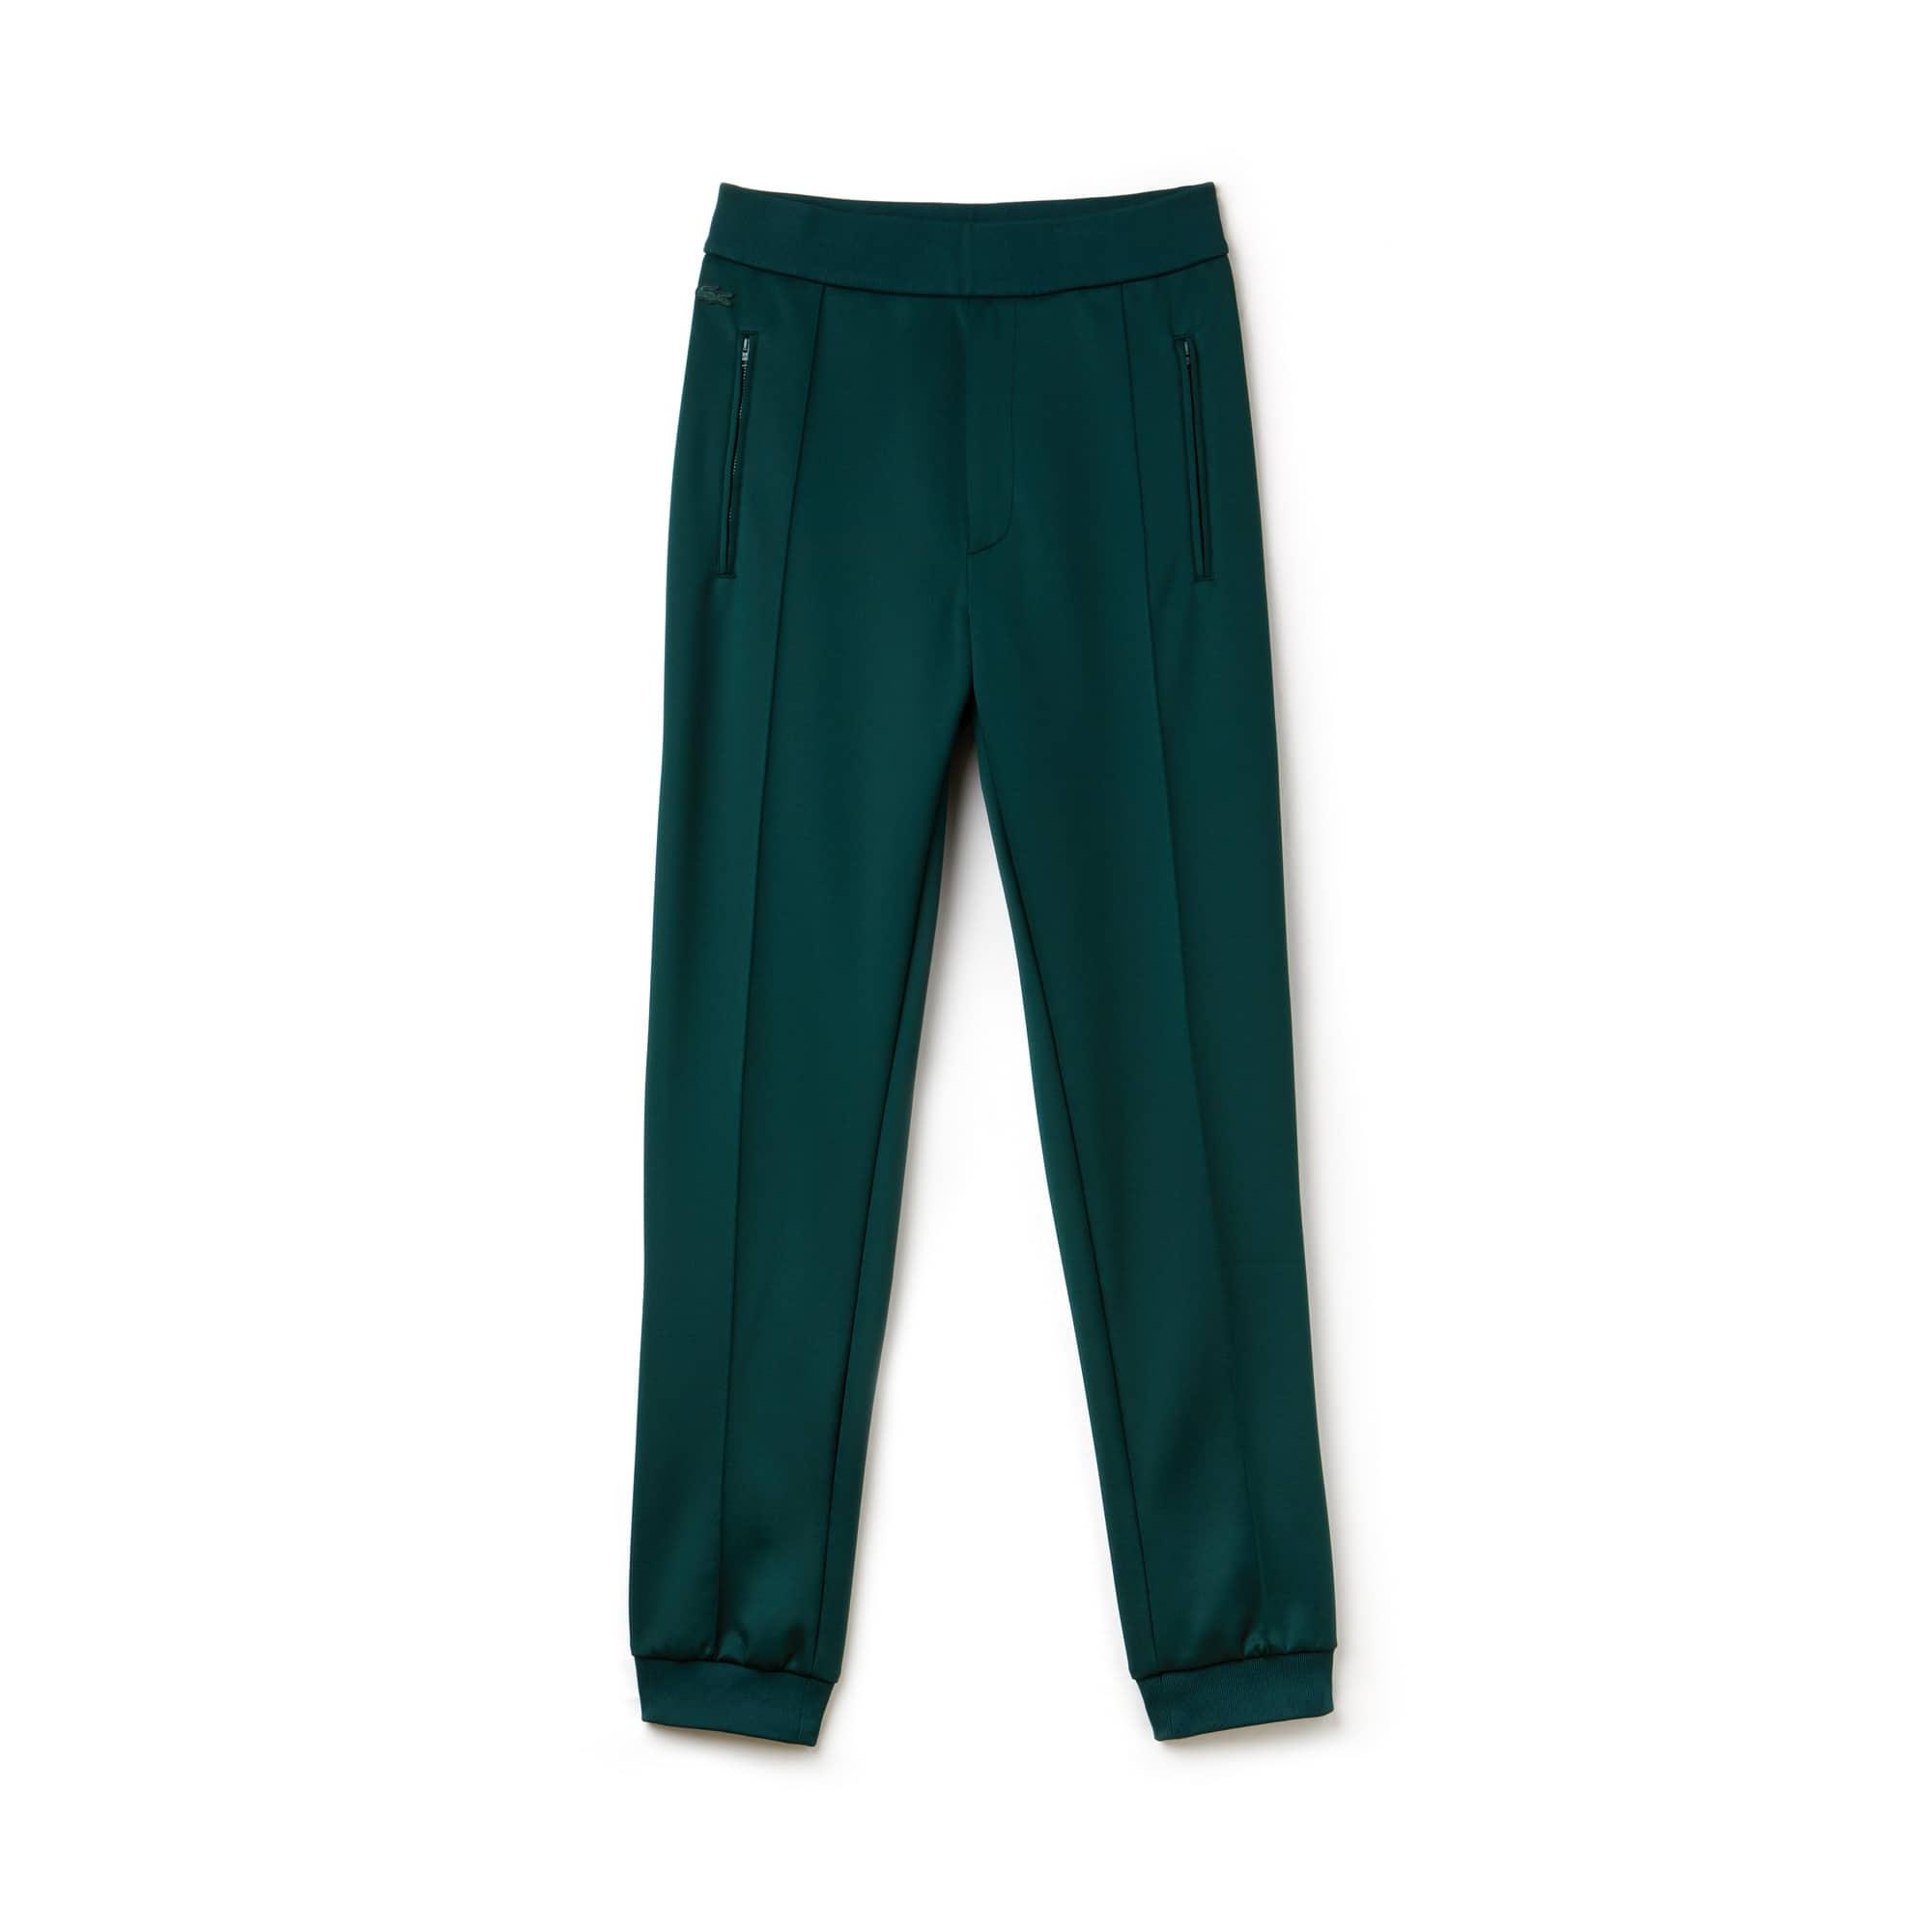 Men's Fashion Show Technical Neoprene Urban Jogging Pants